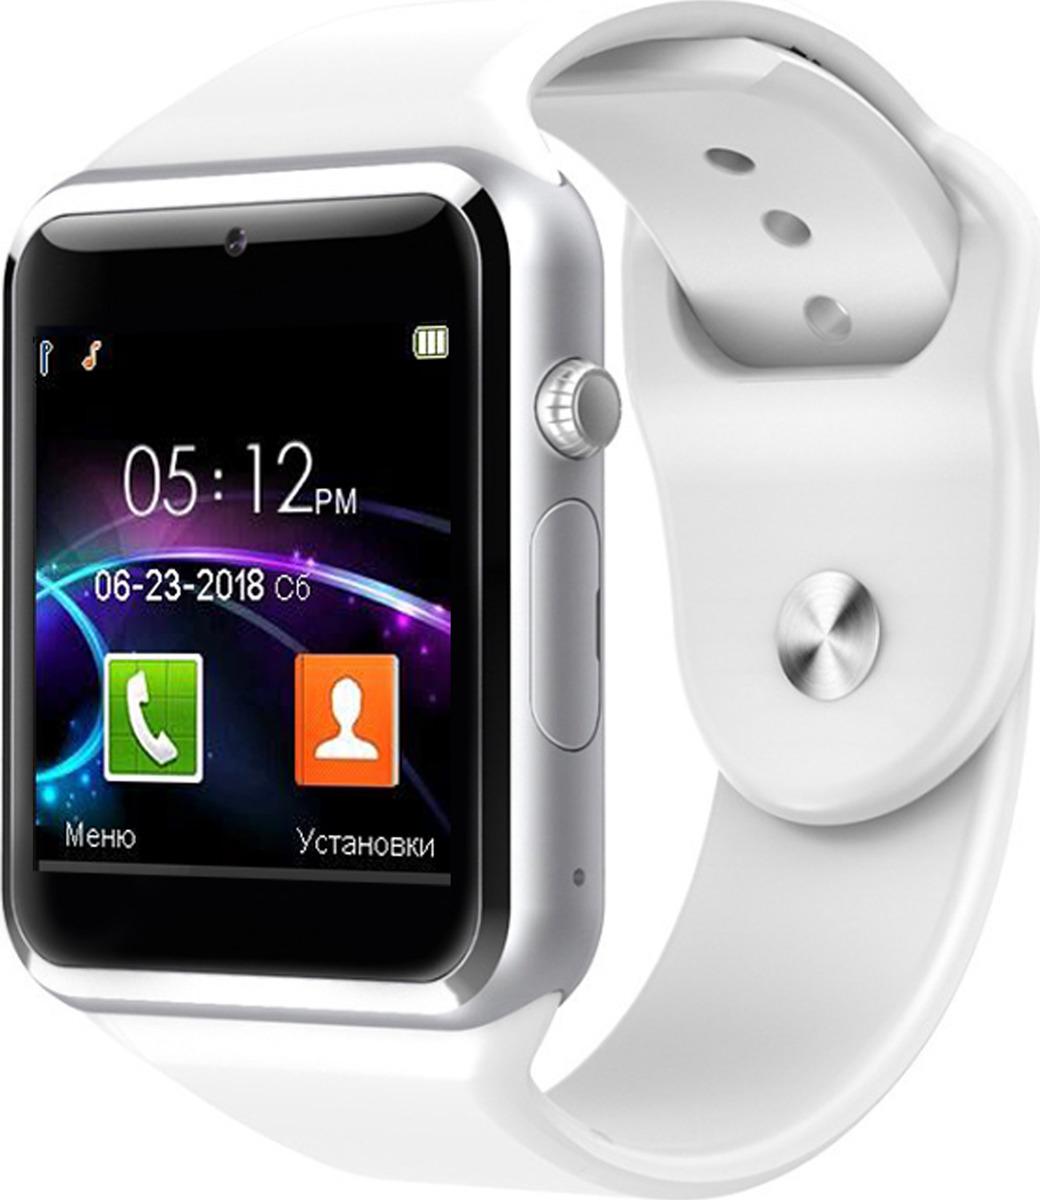 цена на Часы-телефон Jet Phone SP1, серебристый